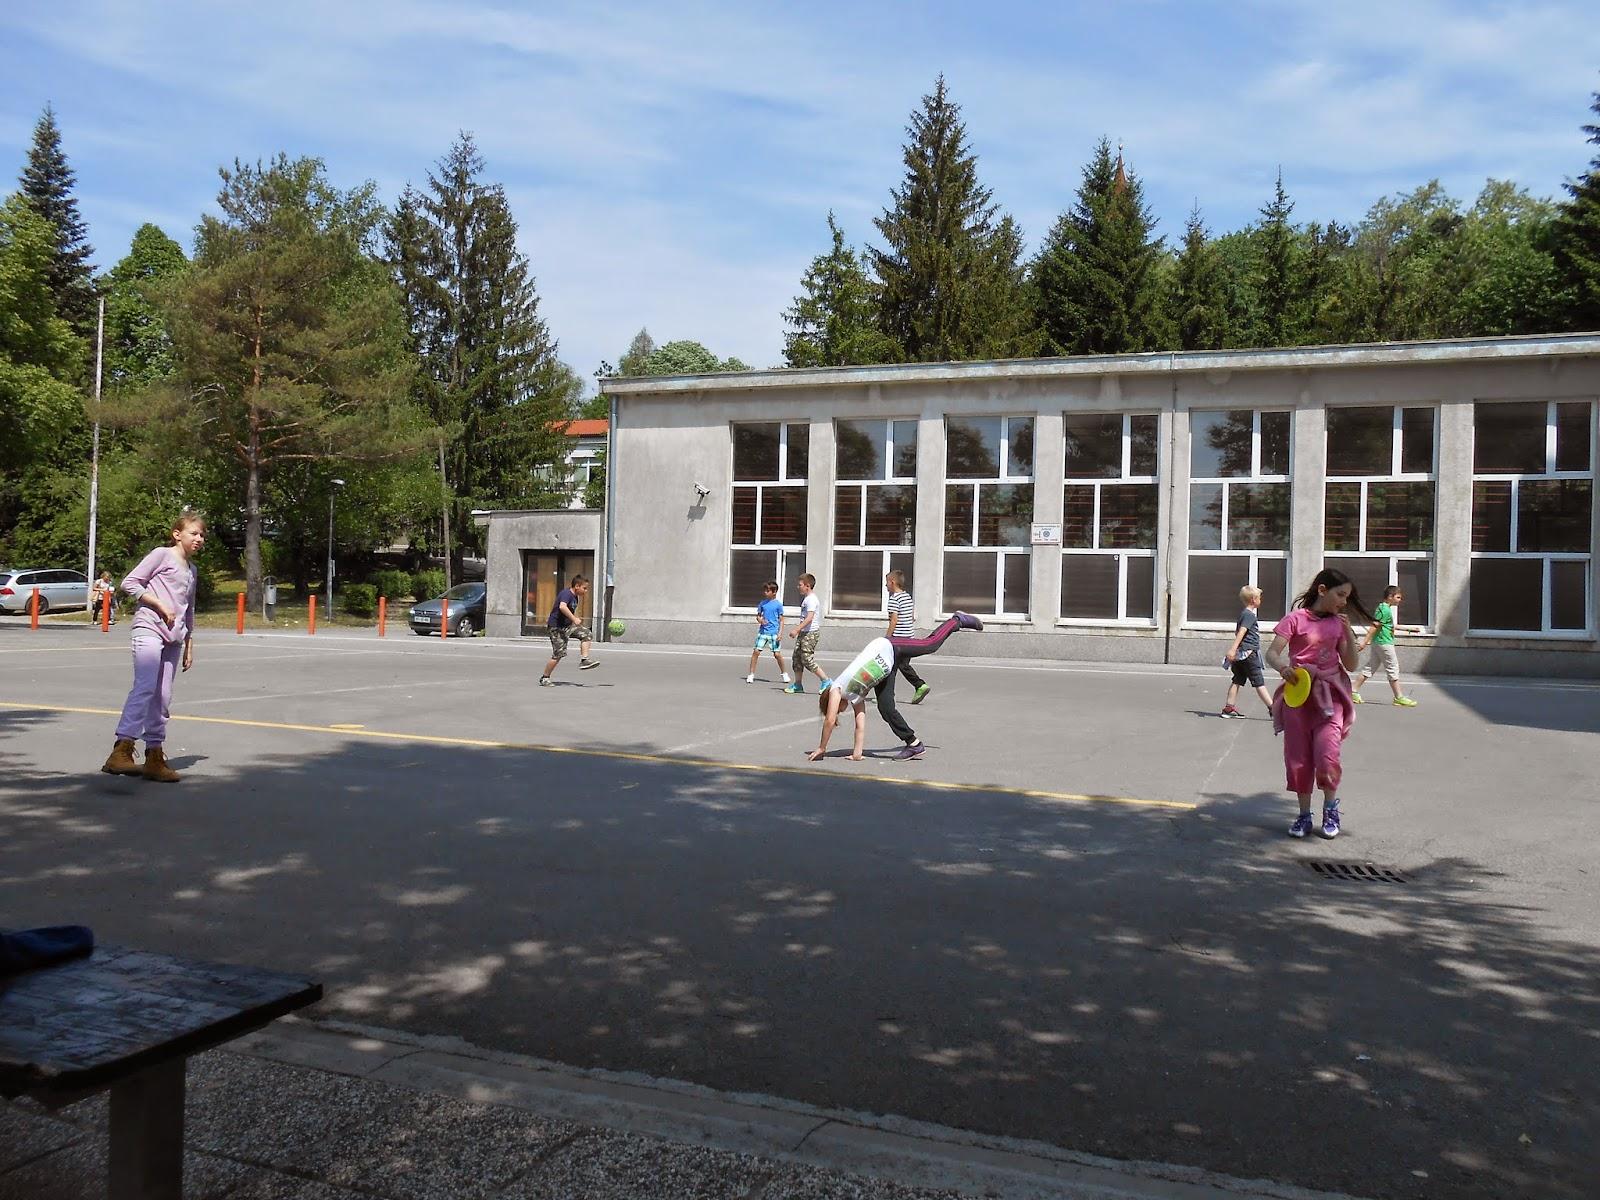 Športni dan 4. a in 4. b, Ilirska Bistrica, 19. 5. 2015 - DSCN4660.JPG